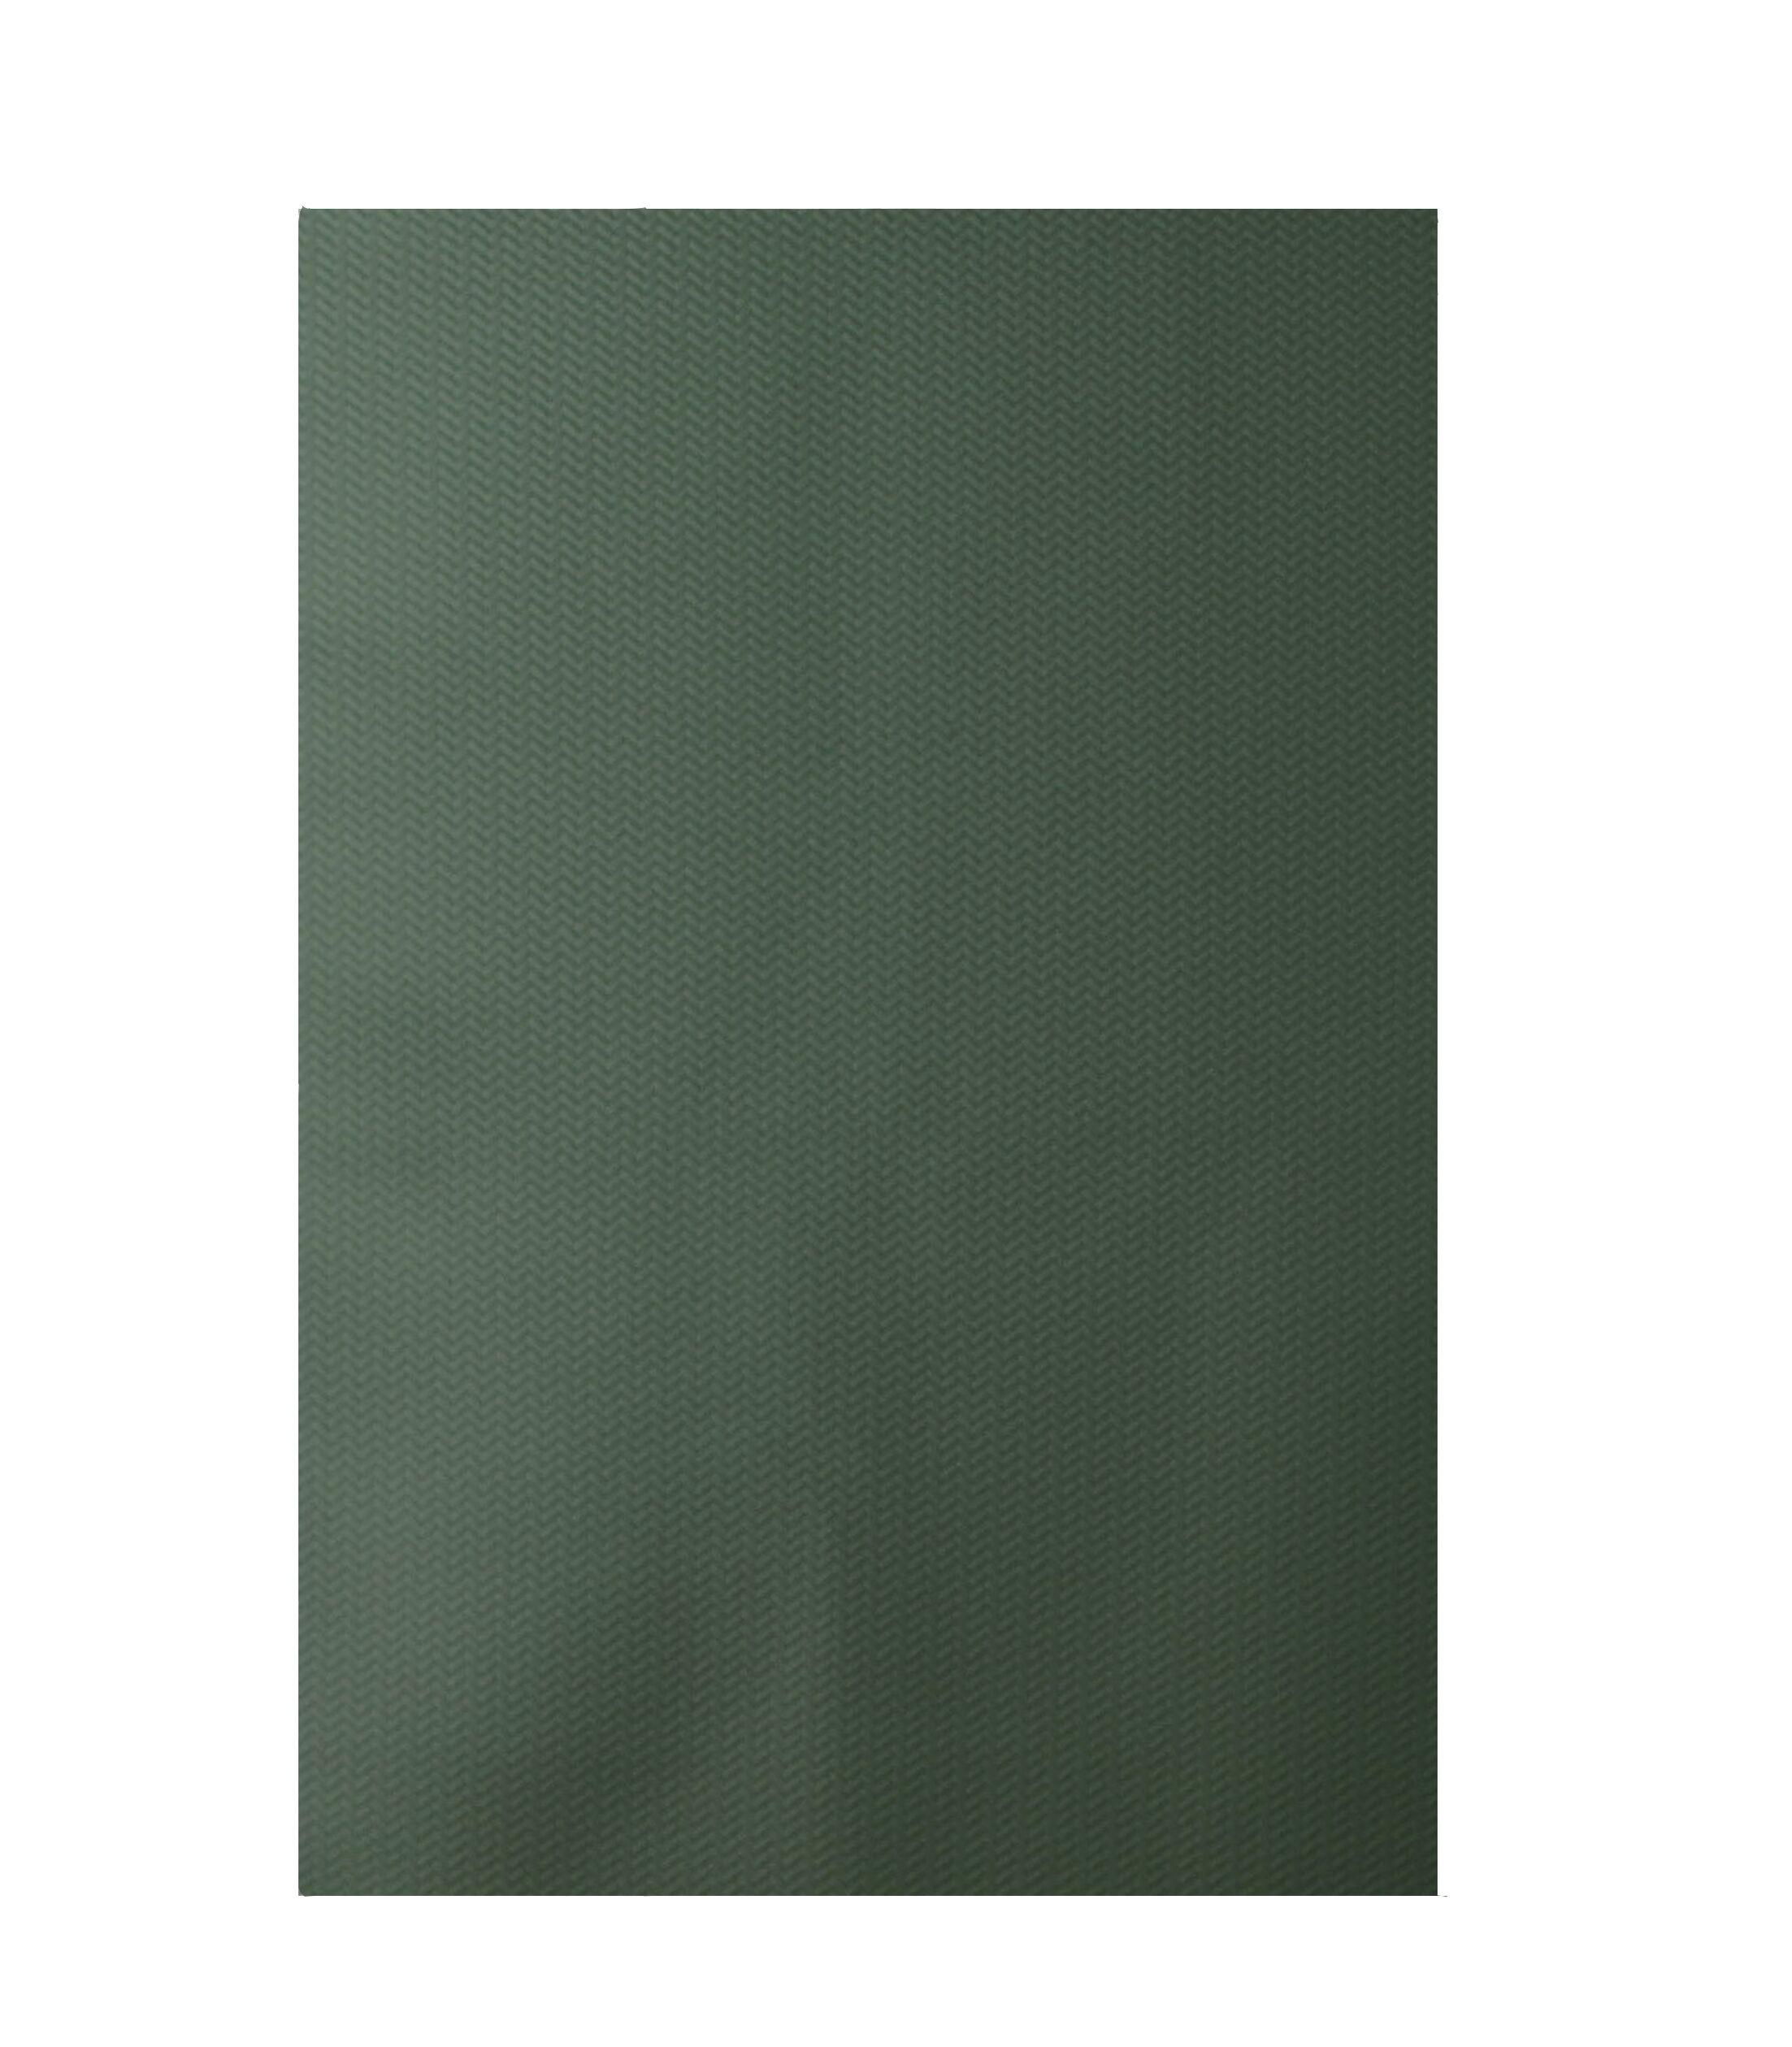 Chevron Green Indoor/Outdoor Area Rug Rug Size: Rectangle 3' x 5'